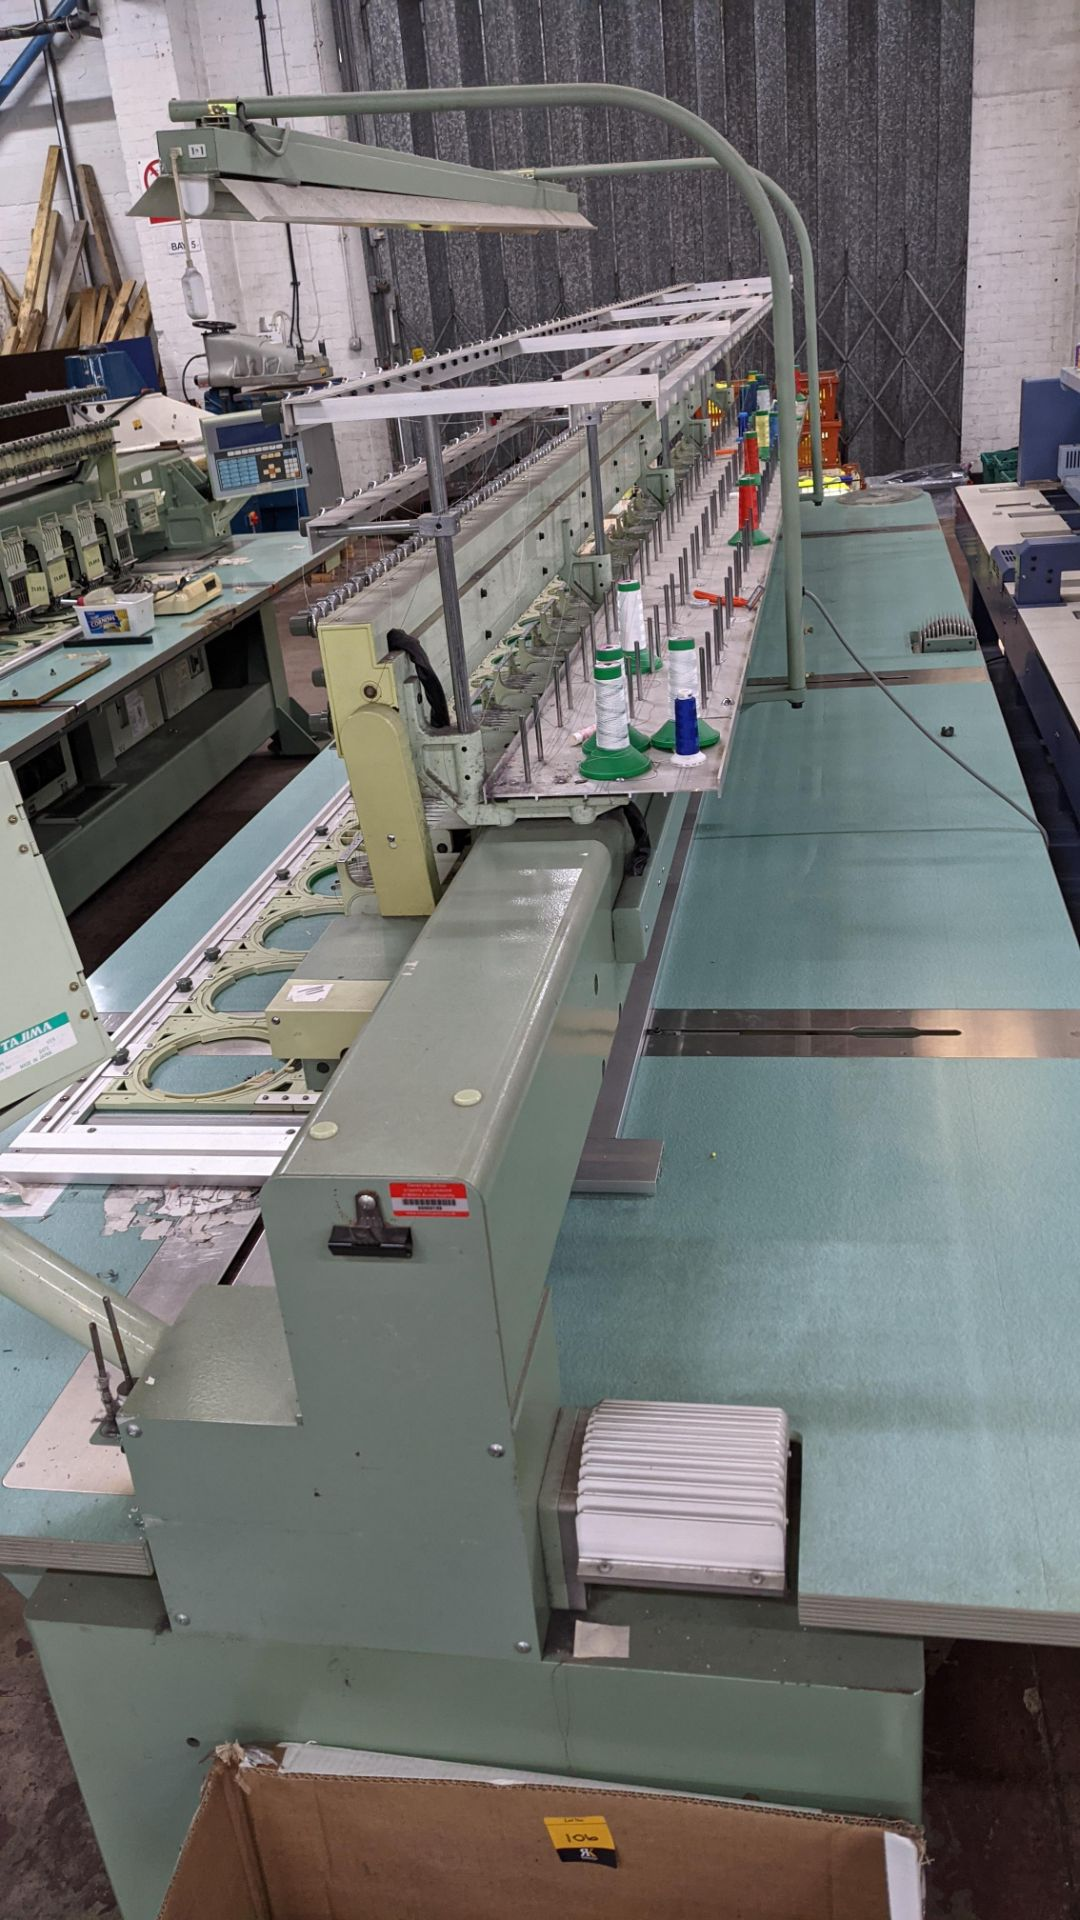 Tokai Tajima electronic 20 head automatic embroidery machine model TMEF-H620 - Image 25 of 25